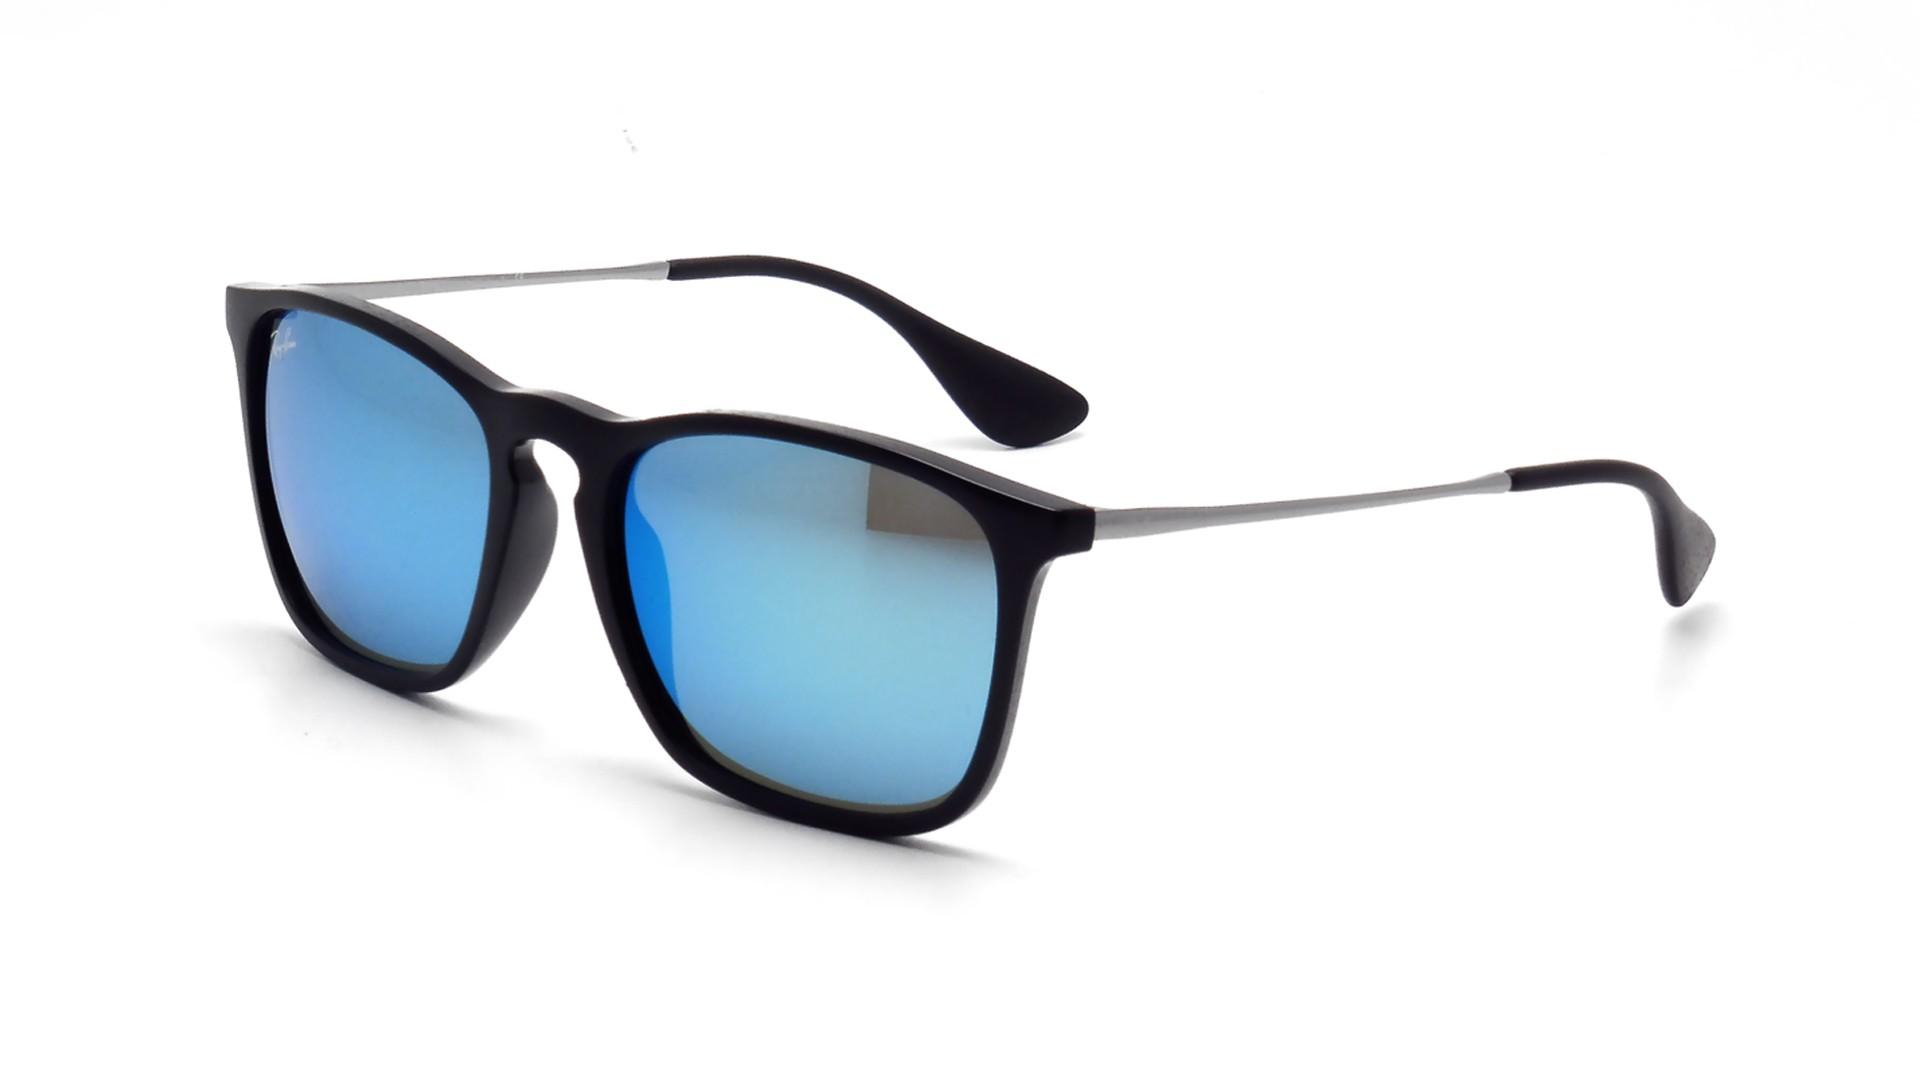 d5cd44482f Sunglasses Ray-Ban Chris Black RB4187 601 55 54-18 Medium Mirror